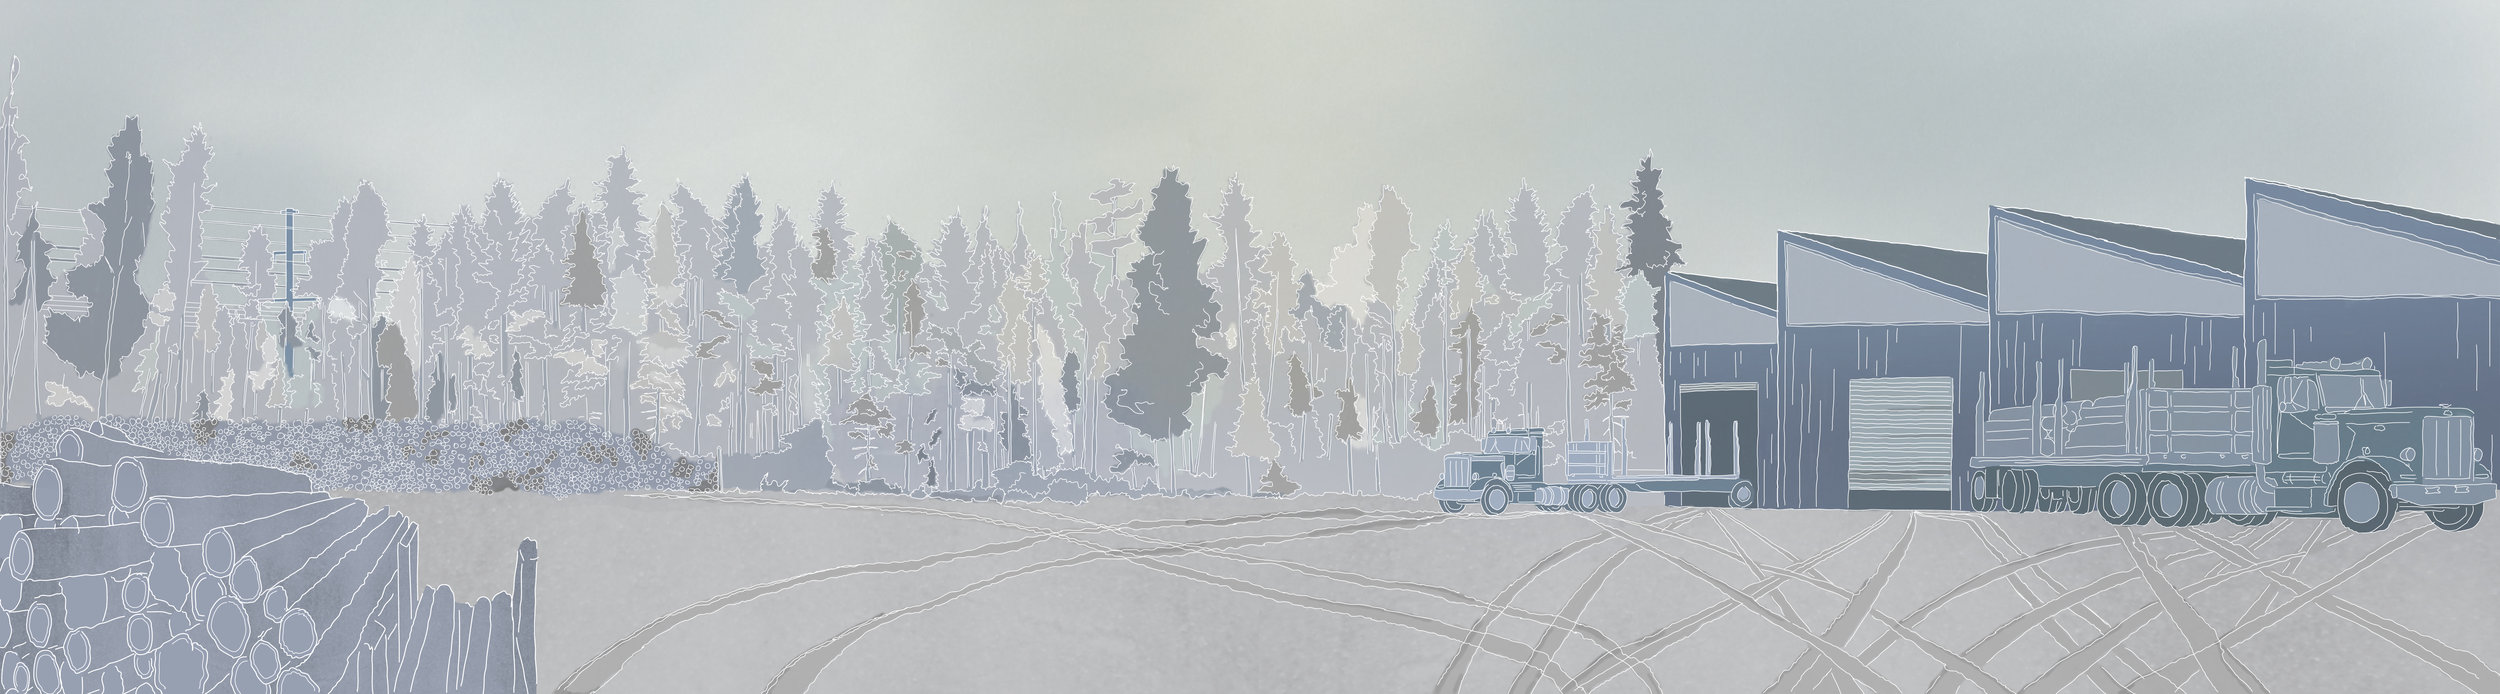 Perspective 2 Factory LINES - Miranda Edits-01.jpg